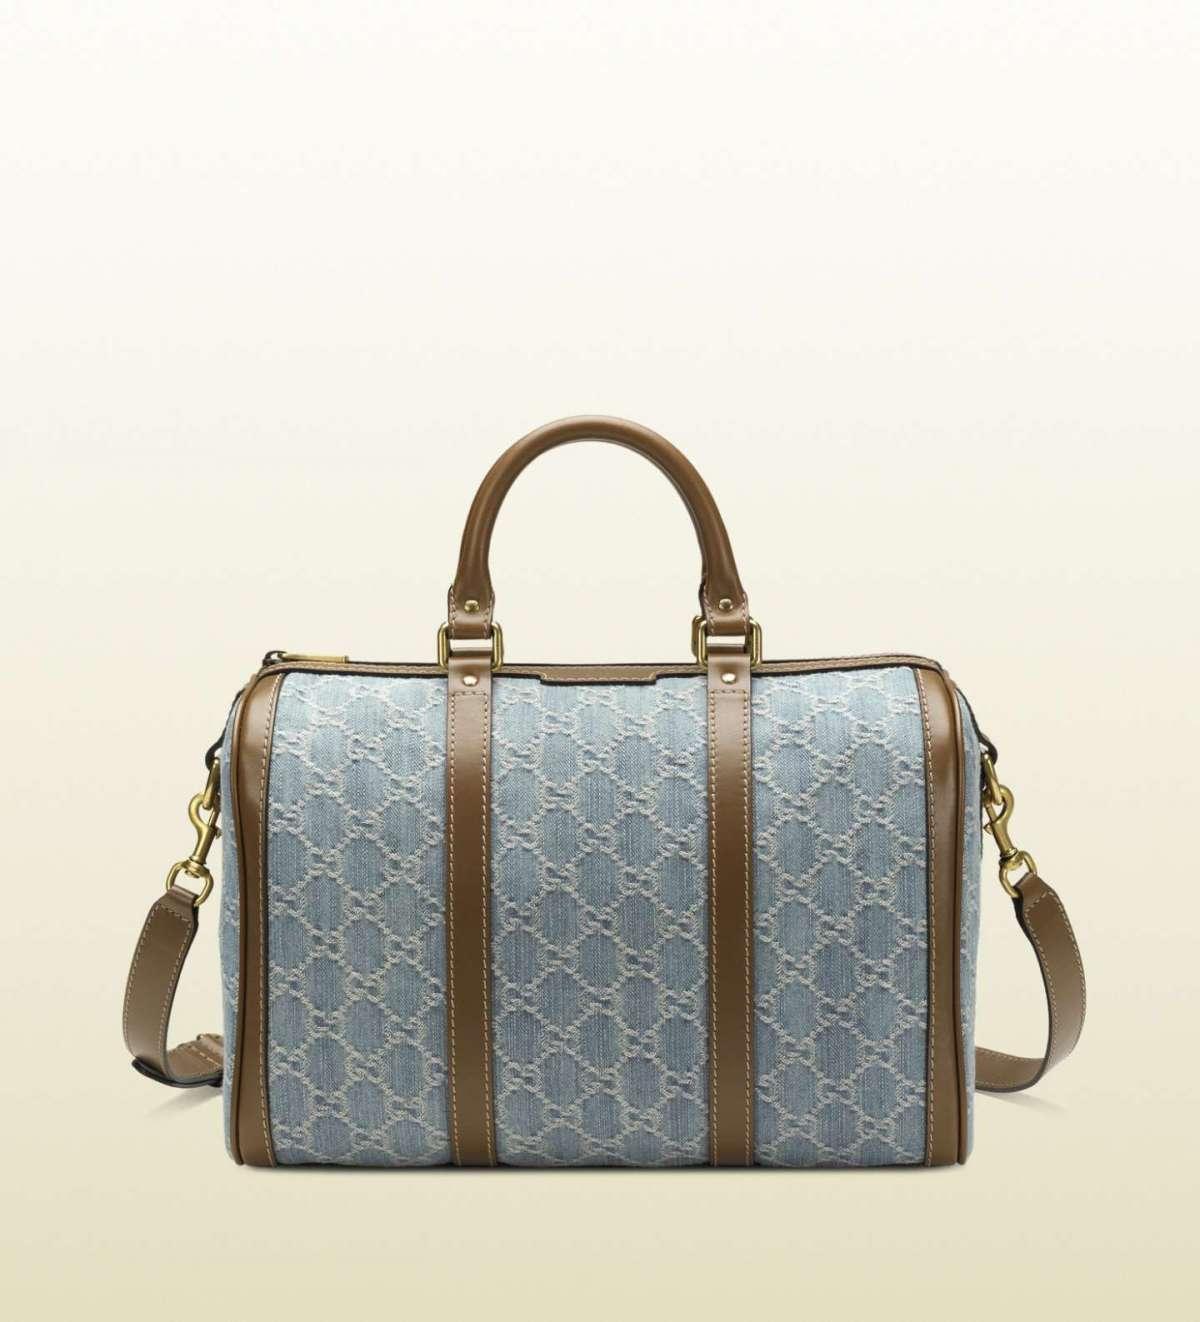 Bauletto blu Gucci Vintage Web